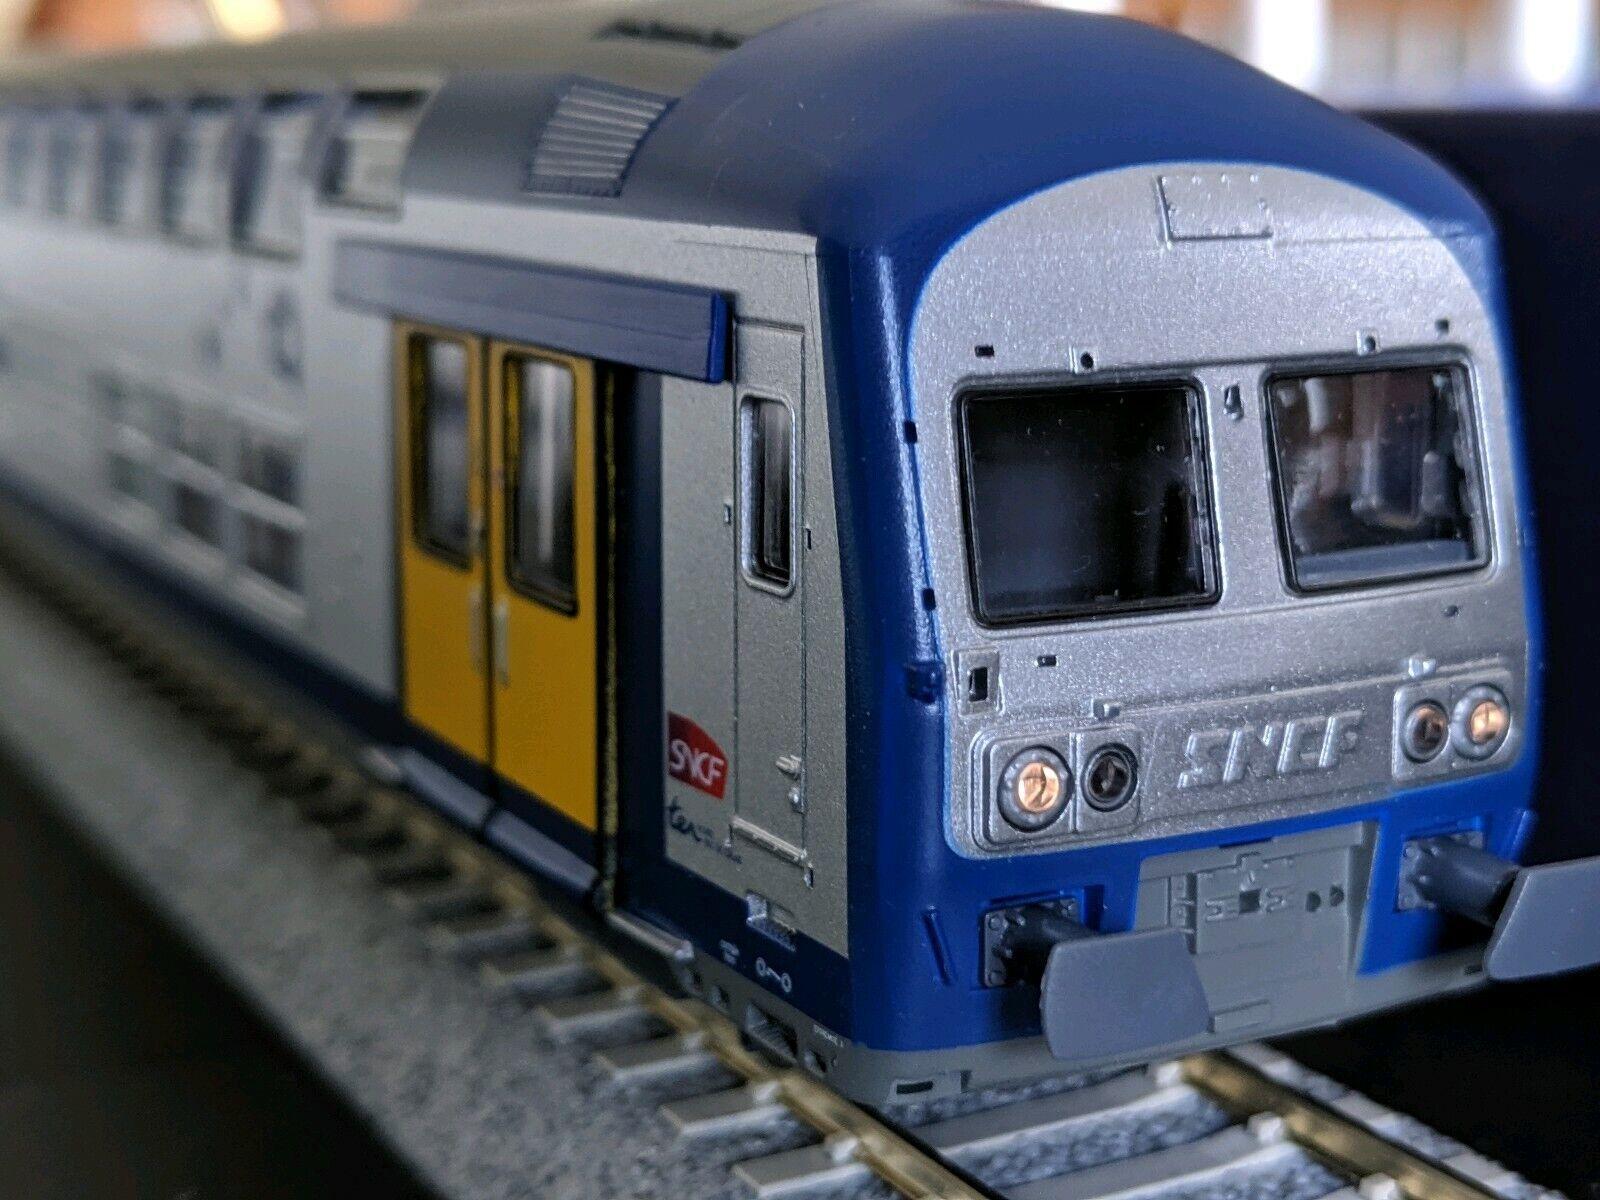 Vitrains Ho Nord Pas De Calais Z2N Blue Bleu VO2N Ho DCC headlight control SNCF